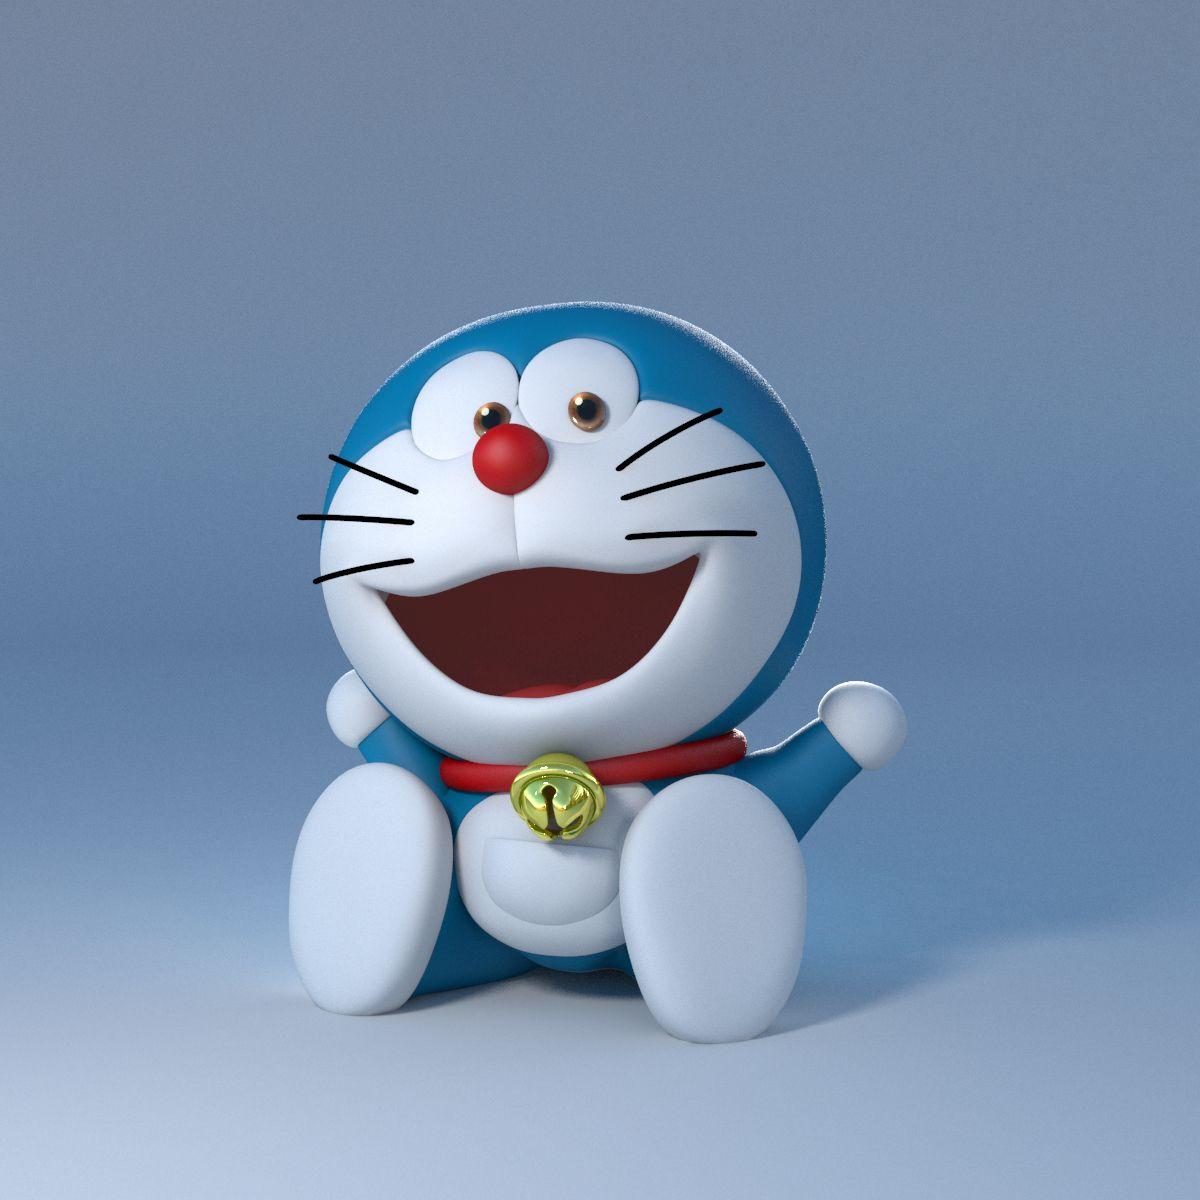 3dsmax Doraemon Cartoon Wallpaper Hd Doraemon Wallpapers Doremon Cartoon Doraemon wallpaper images 3d